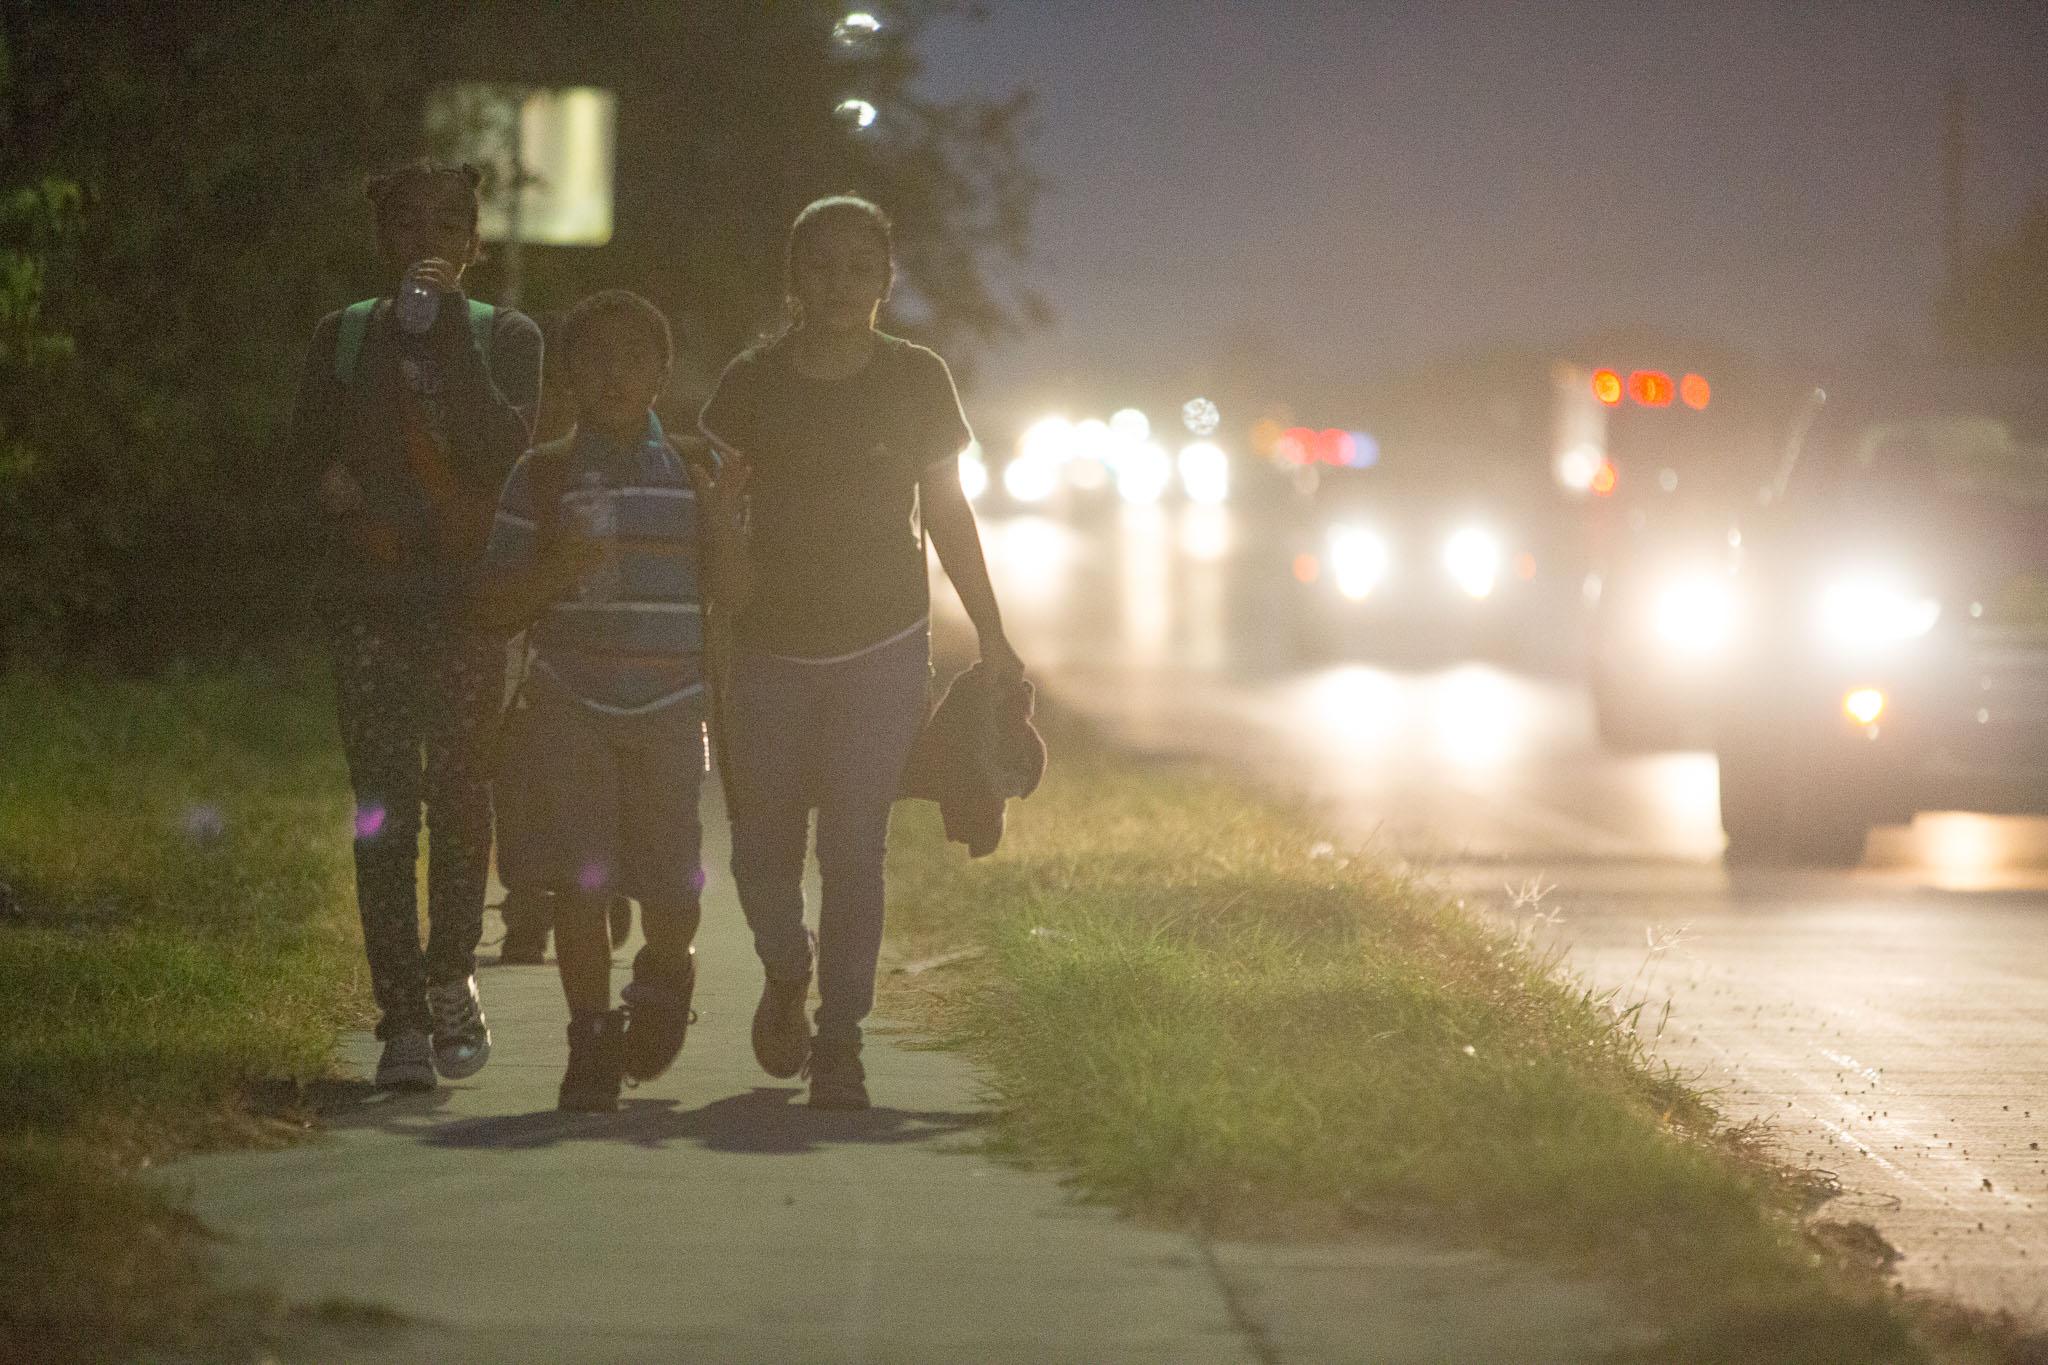 Students of Hutchens middle school Navyih Herrera, Rosalynn Gonzalez, and Chad Herrera, walk along Zarzamora Street during their morning commute to morning class.